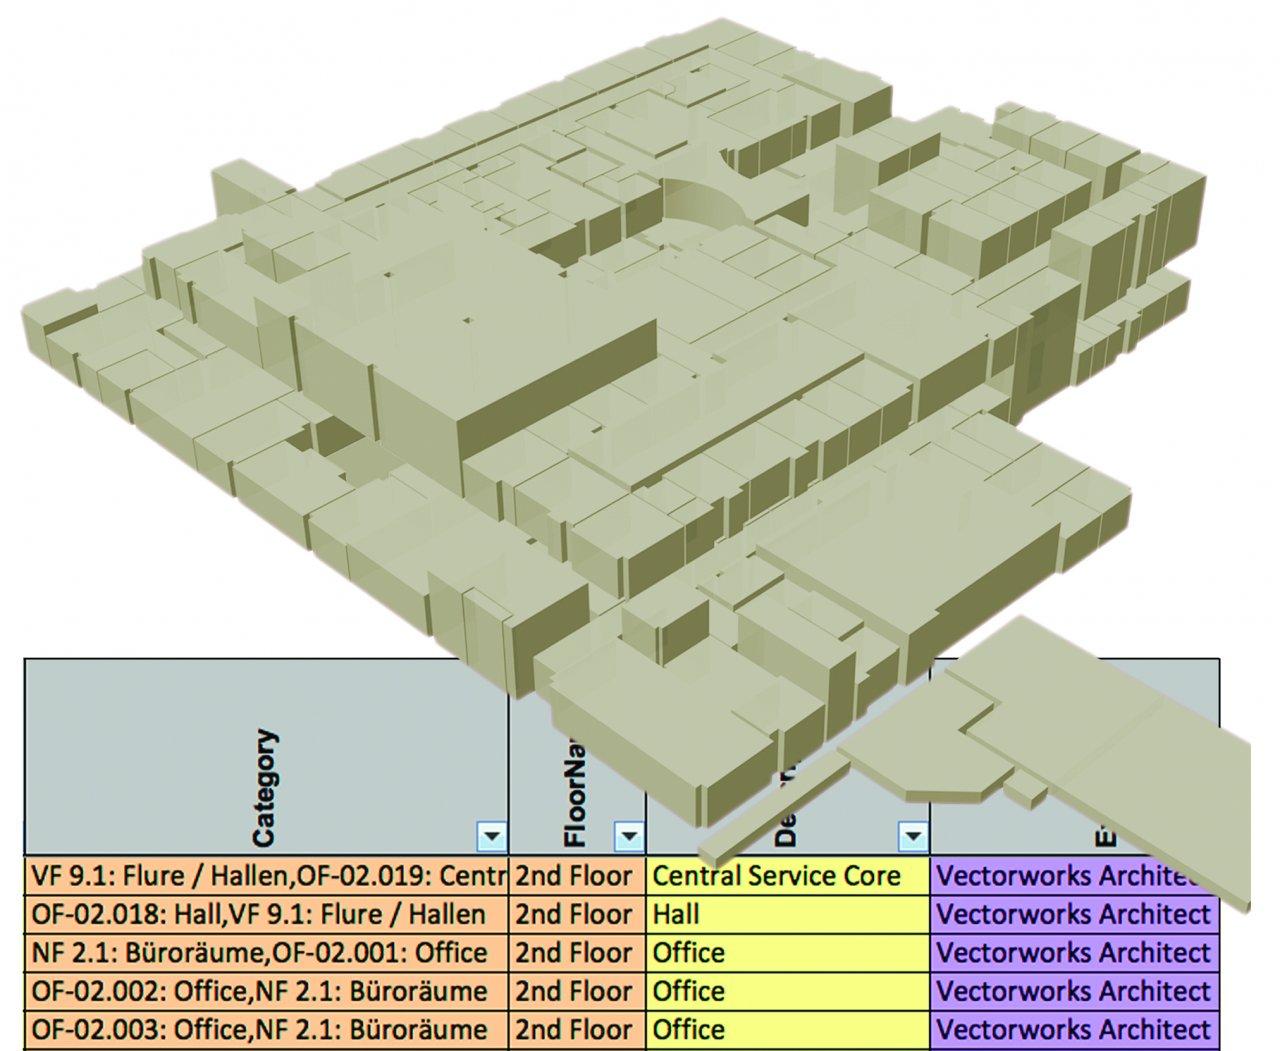 COBie-Facilities Management for IFC Export